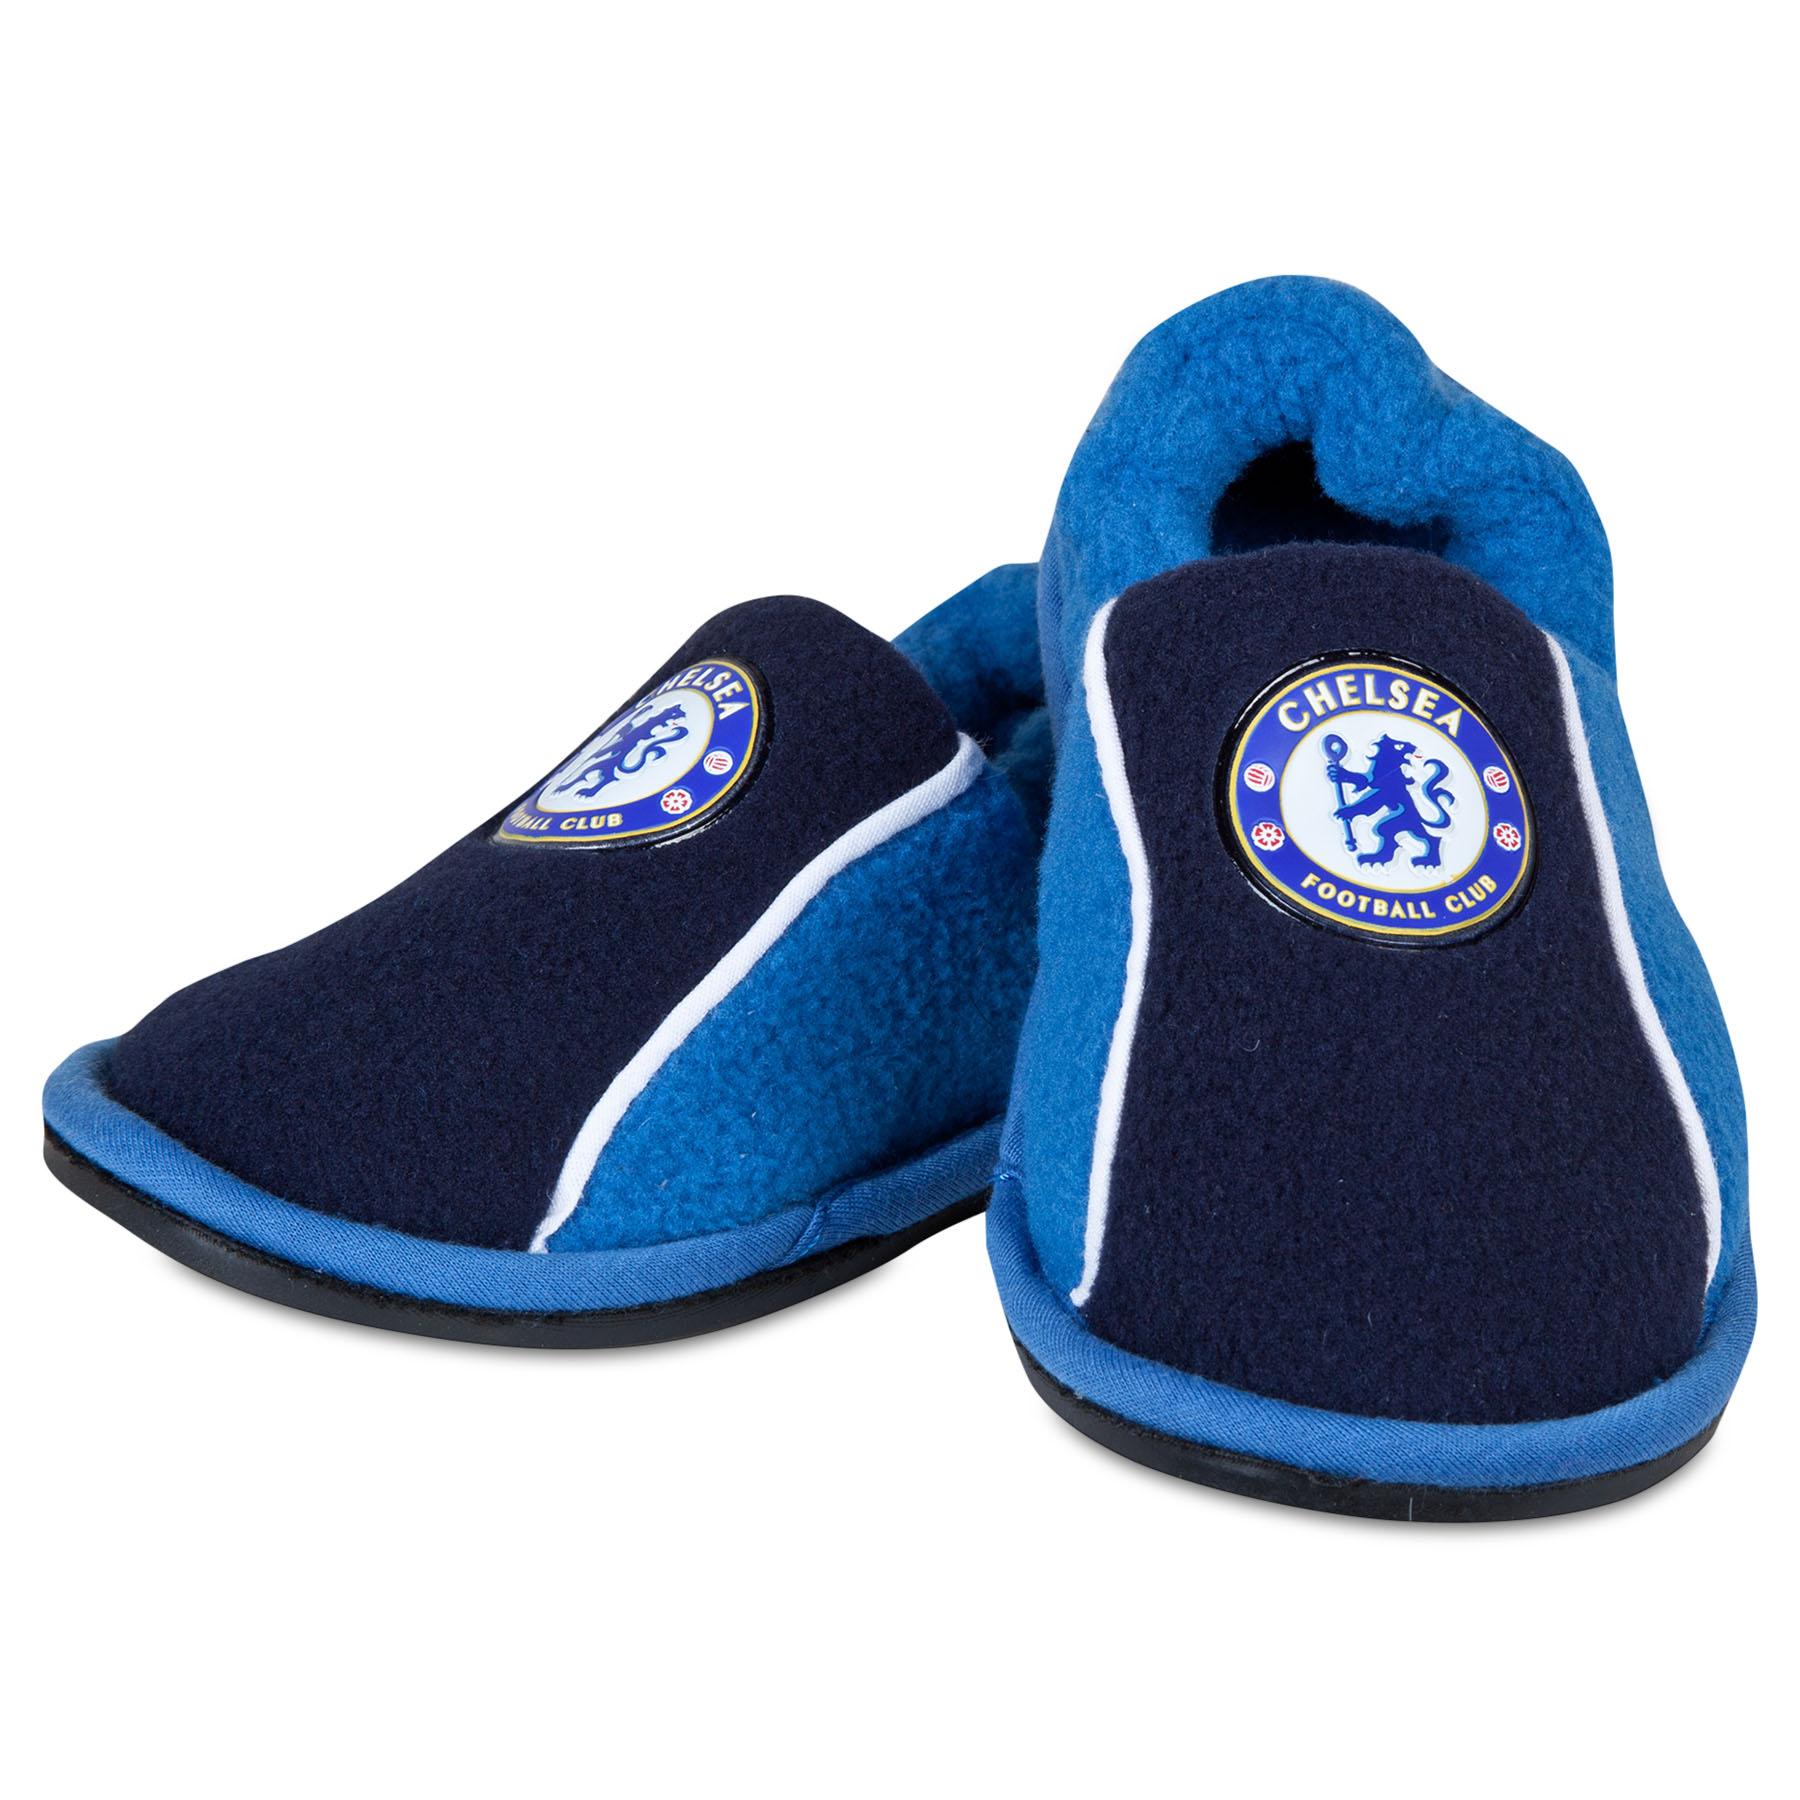 Chelsea Stretch Heel Slippers - Reflex Blue - Boys